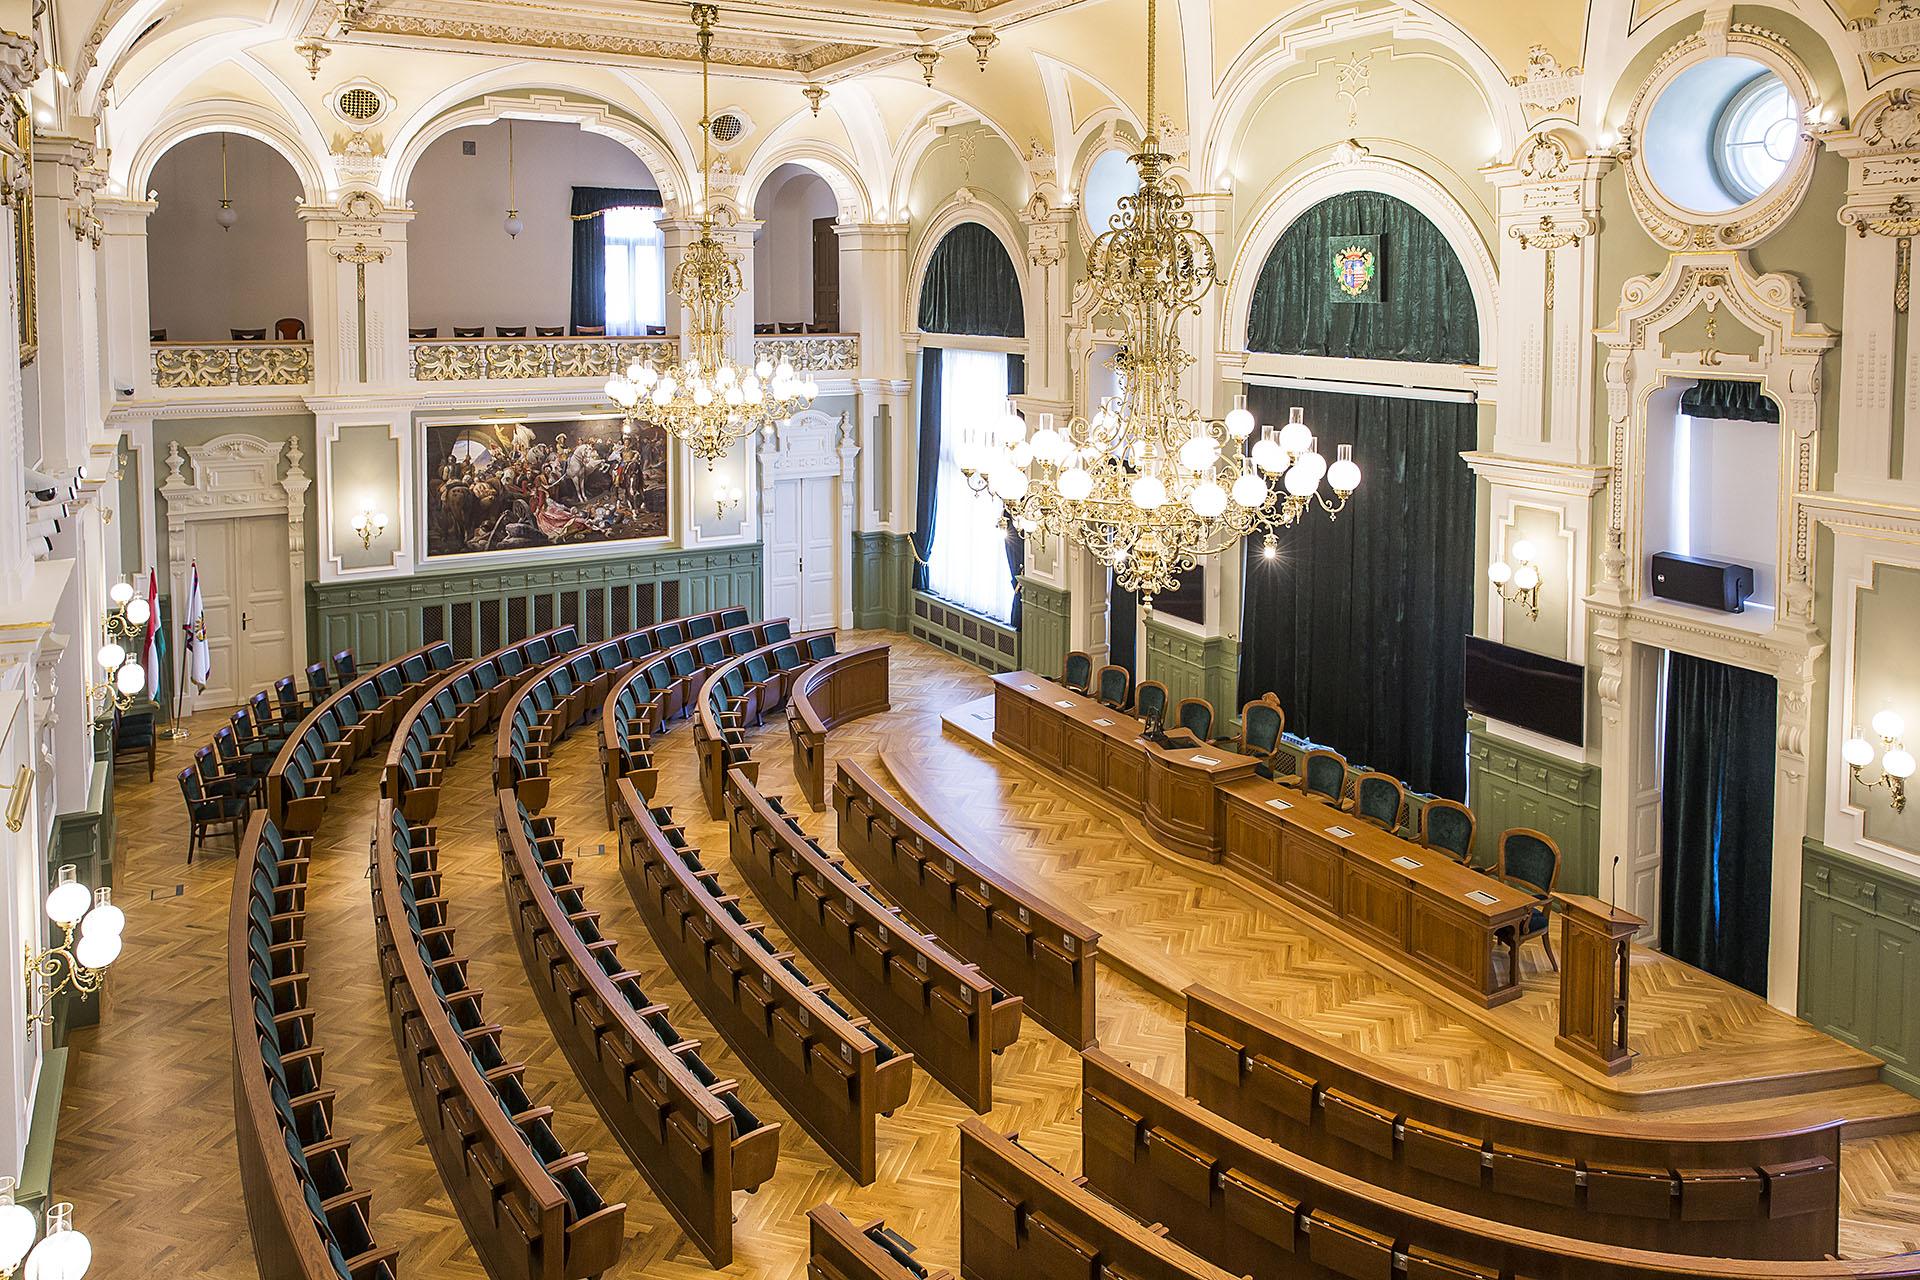 HU Györ Rathaus Festsaal 01 web1